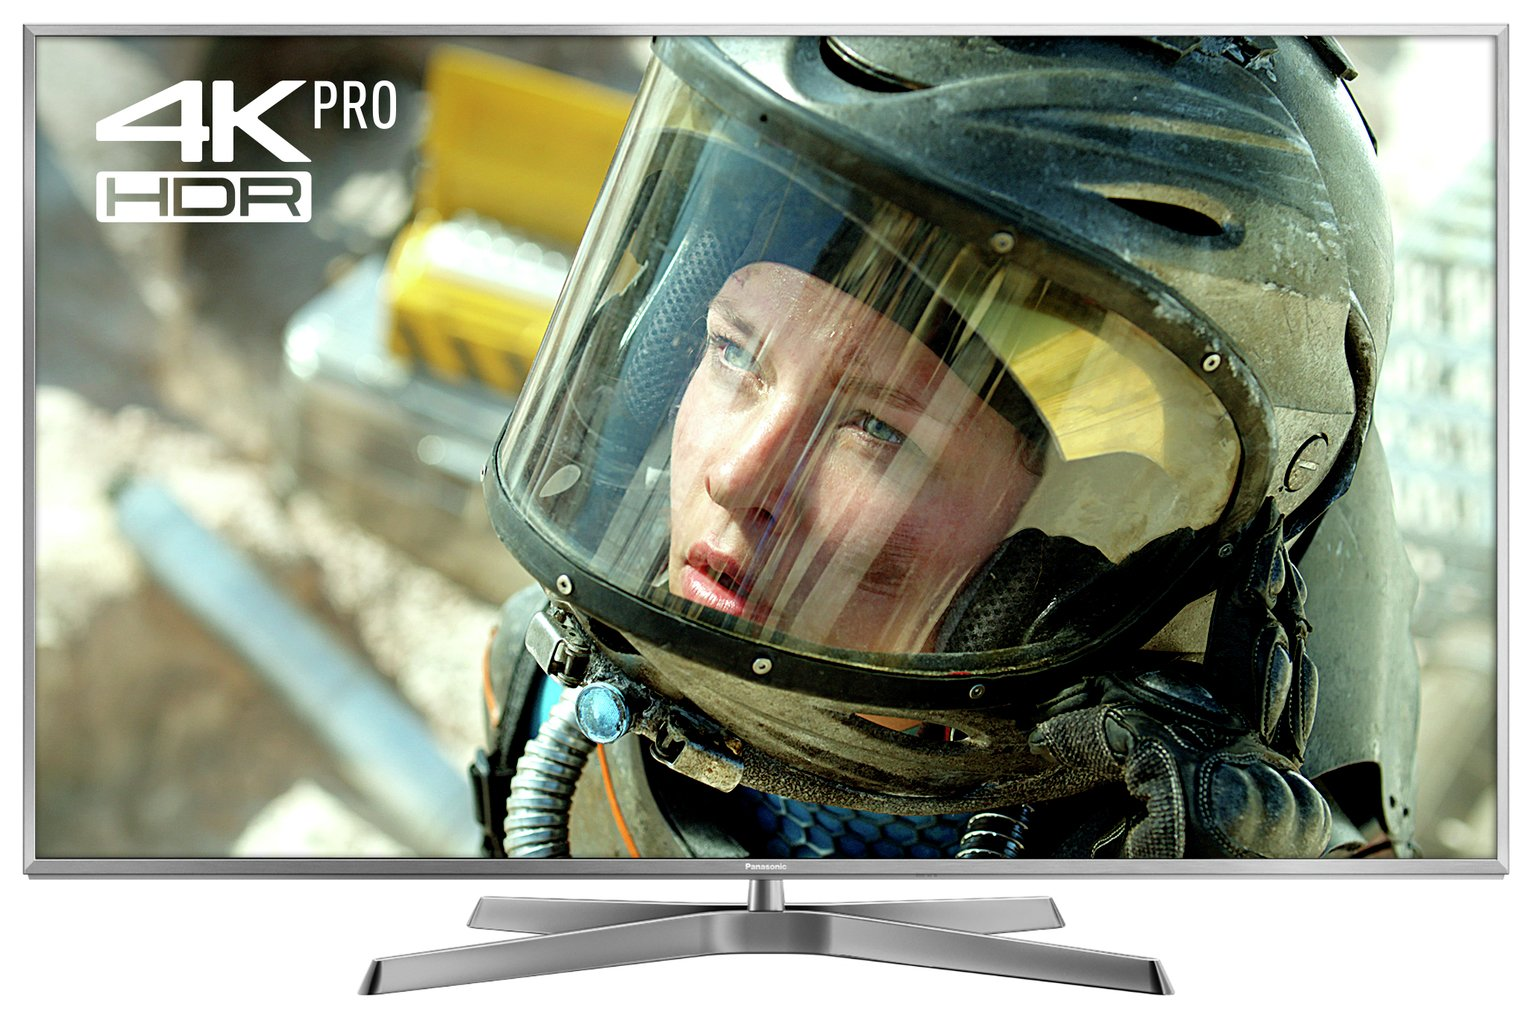 Panasonic Panasonic TX-50EX750B 50 Inch 4K Ultra HD Smart TV